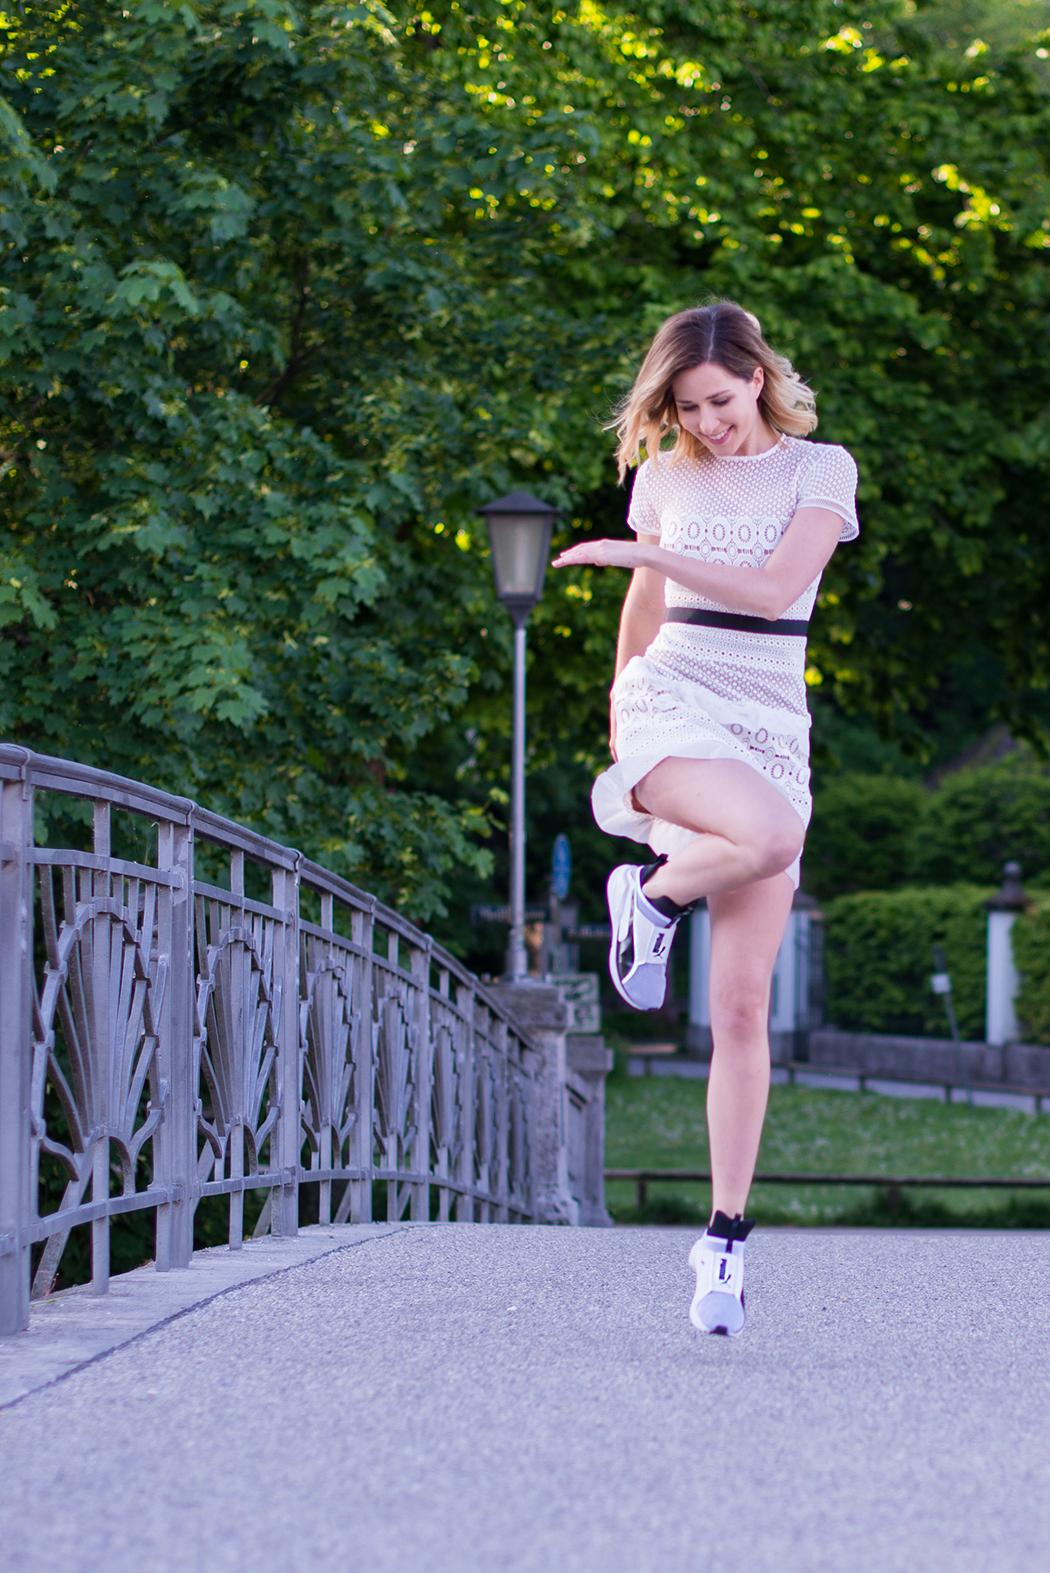 Fitnessblog-Fitnessblogger-Fitness-Blog-Blogger-Fashion-Fashionblog-Fashionblogger-Muenchen-Deutschland-Puma-Fierce-Selfportrait-Kleid-weiß-3